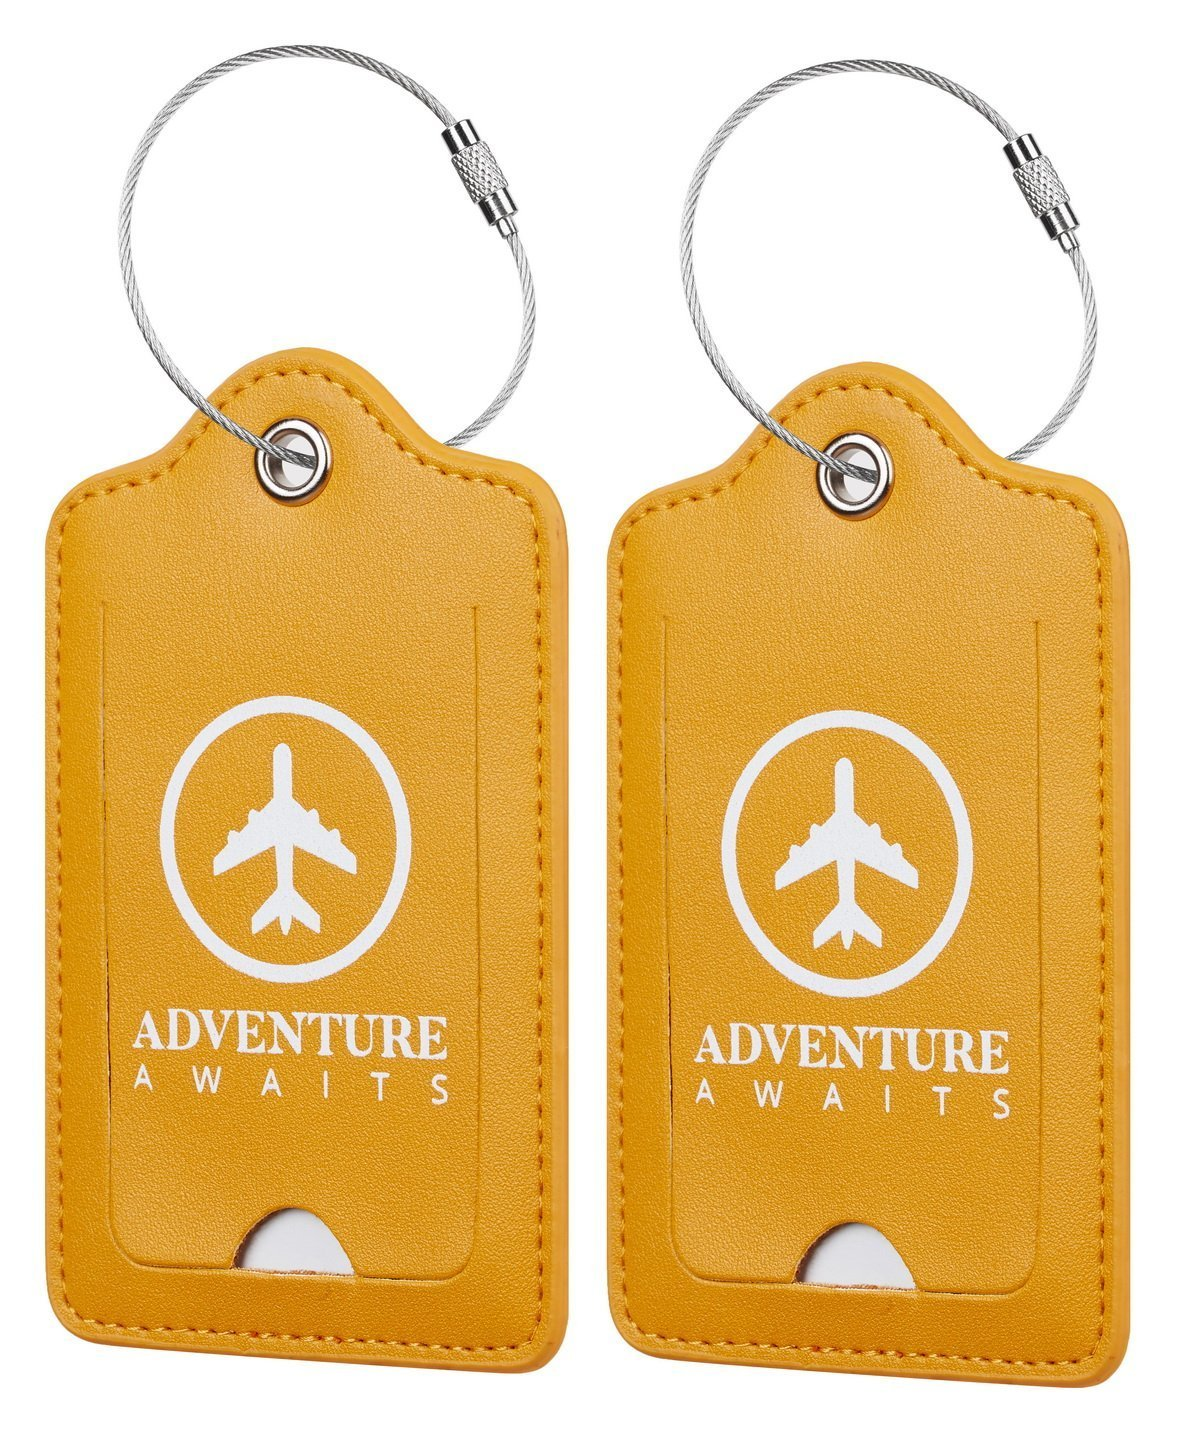 Chelmon Leather Luggage Tags Baggage Bag Instrument Tag 2 Pcs Set (Yellow Glaze 3167)